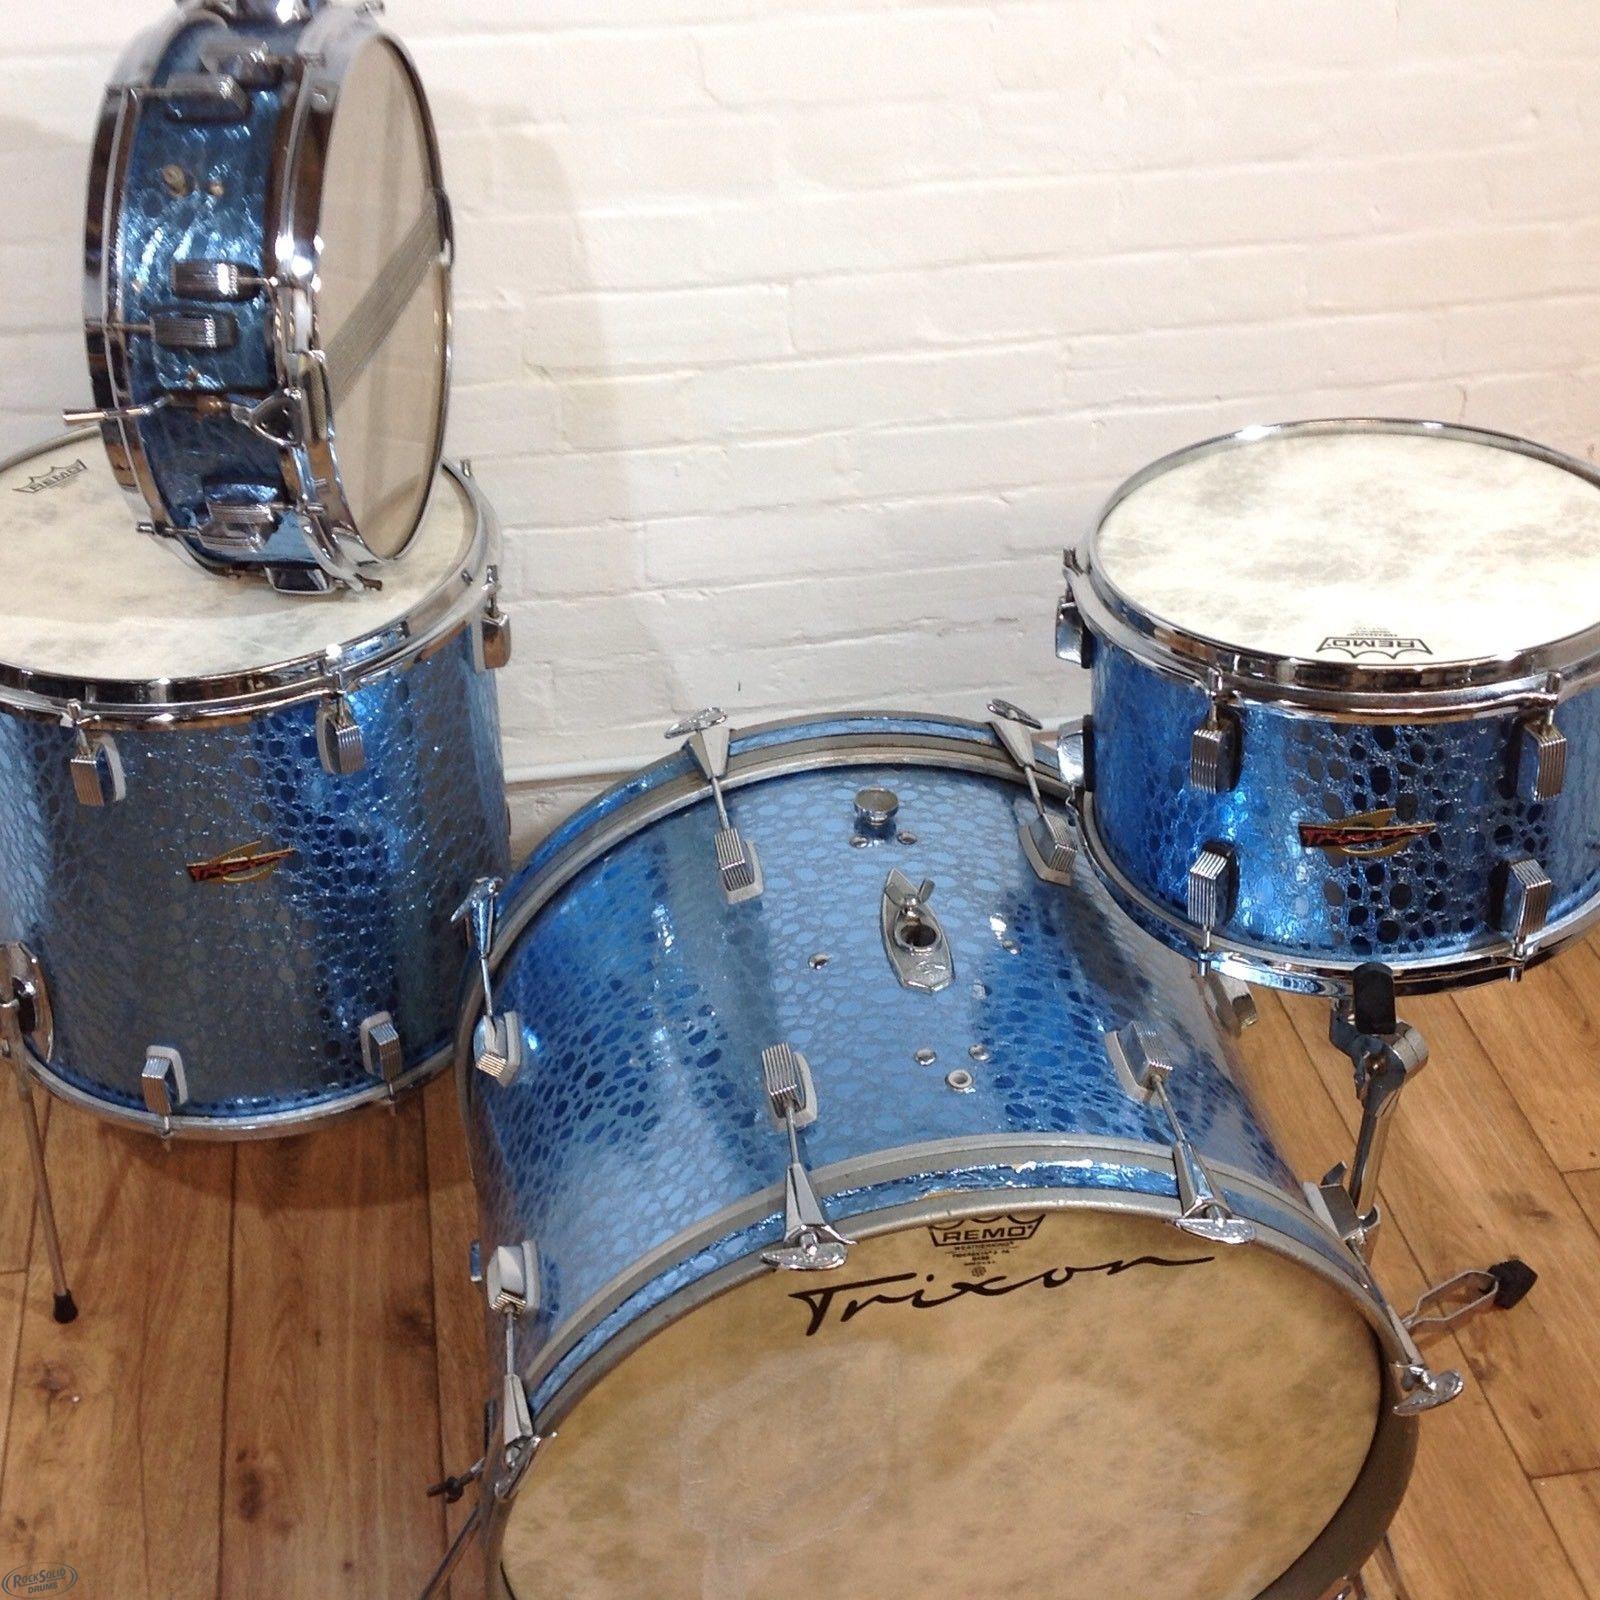 Trixon Luxus Blue Croco kit with Snare Drum – Rock Solid Drums 90def9792